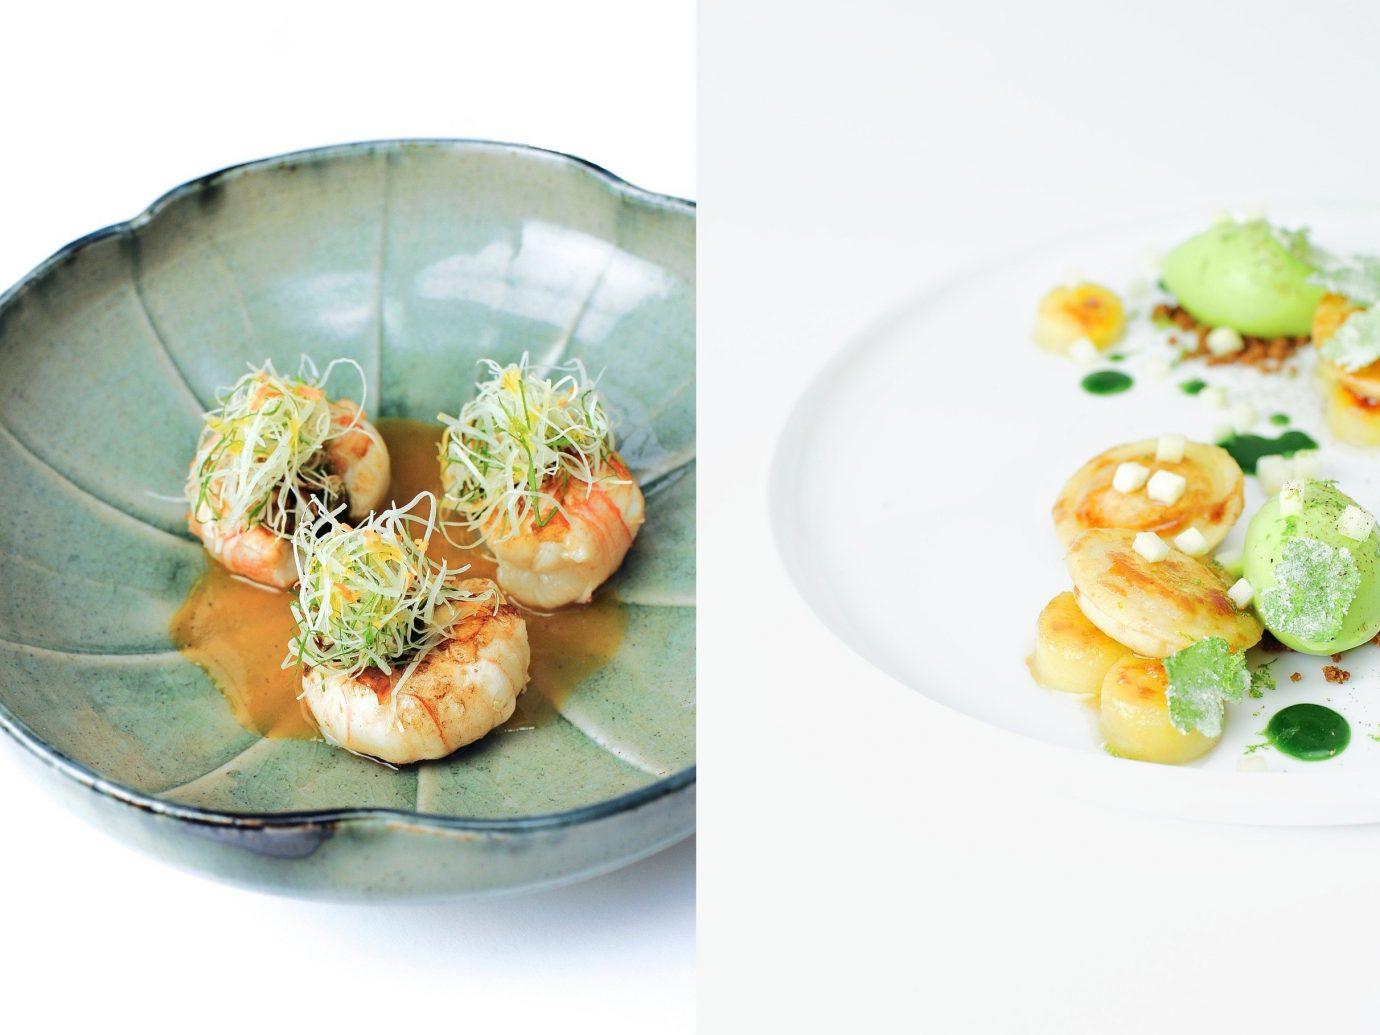 Trip Ideas plate food dish produce cuisine meal flowering plant sliced arranged fresh